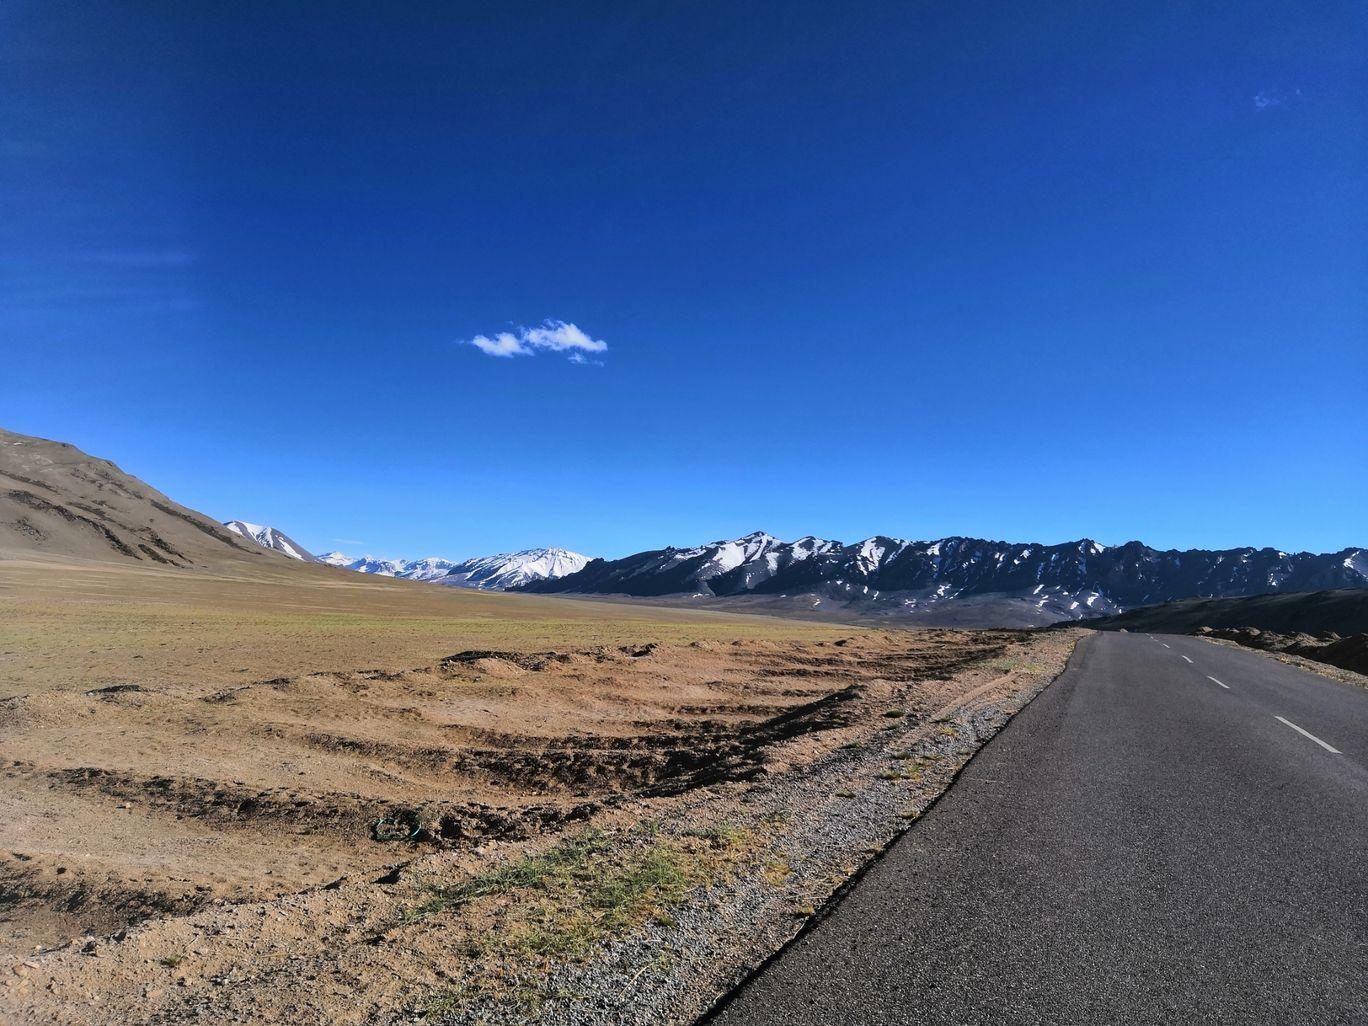 Photo of Ladakh By Abhishek Bhowal